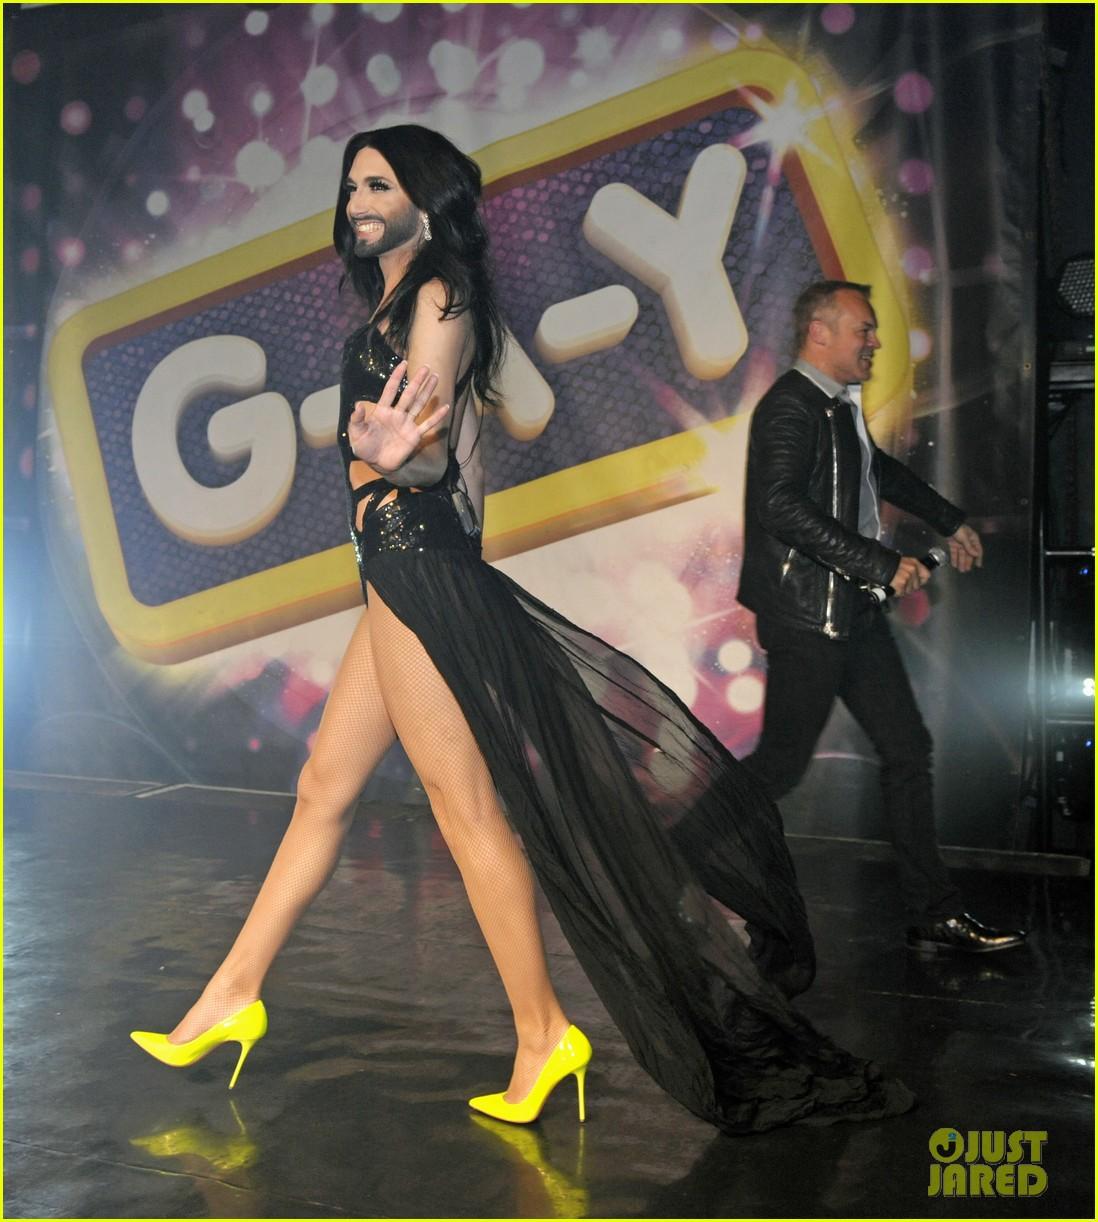 conchita wurst shoots down lady gaga tour rumors 033121854